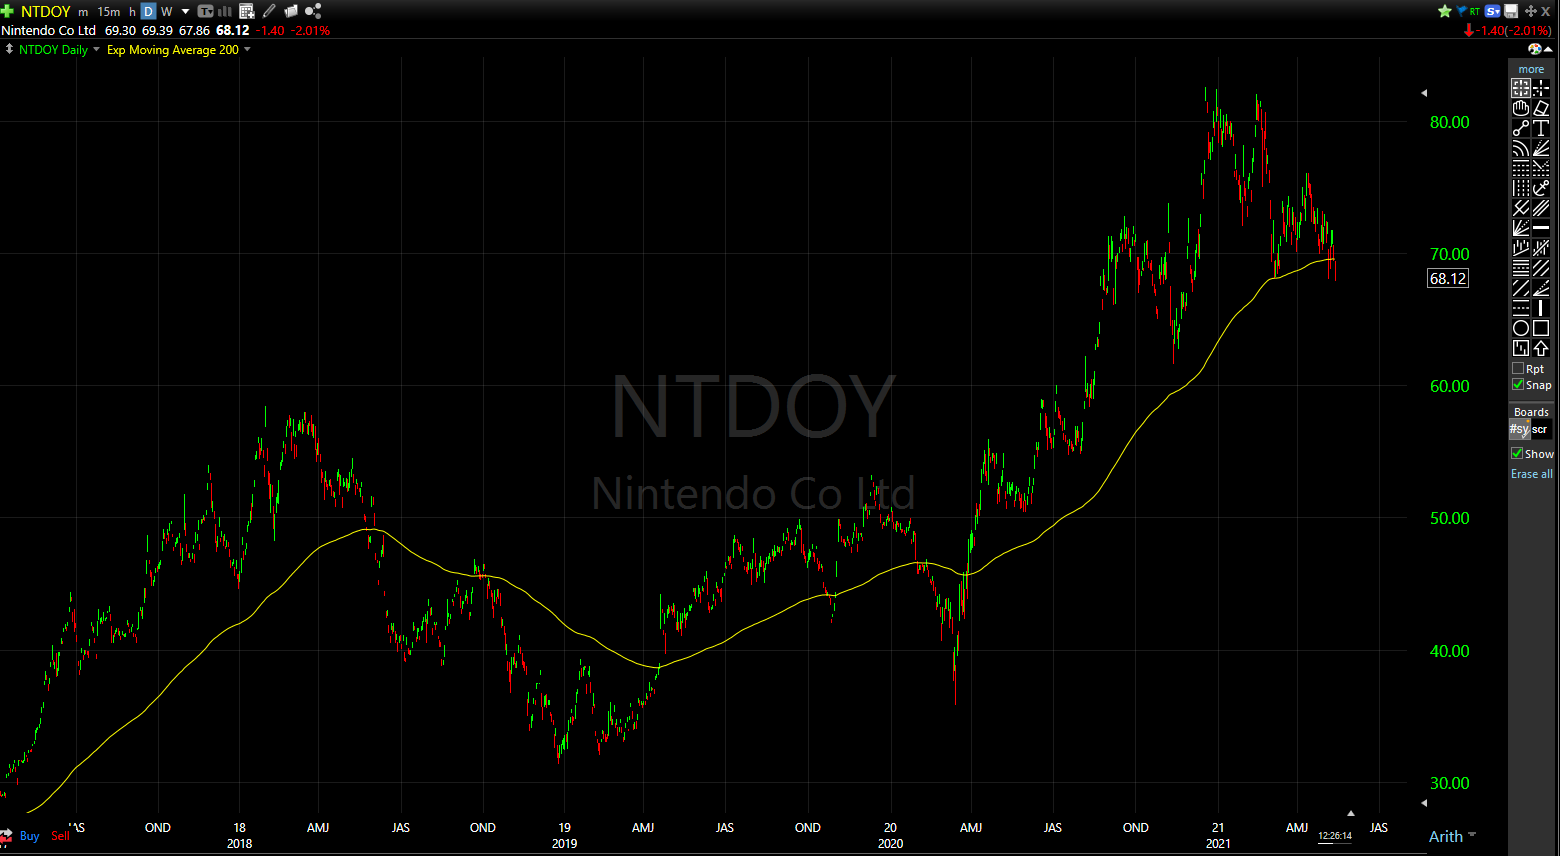 NIntendo has a history of breaking down when it breaks below its 200-day moving average.